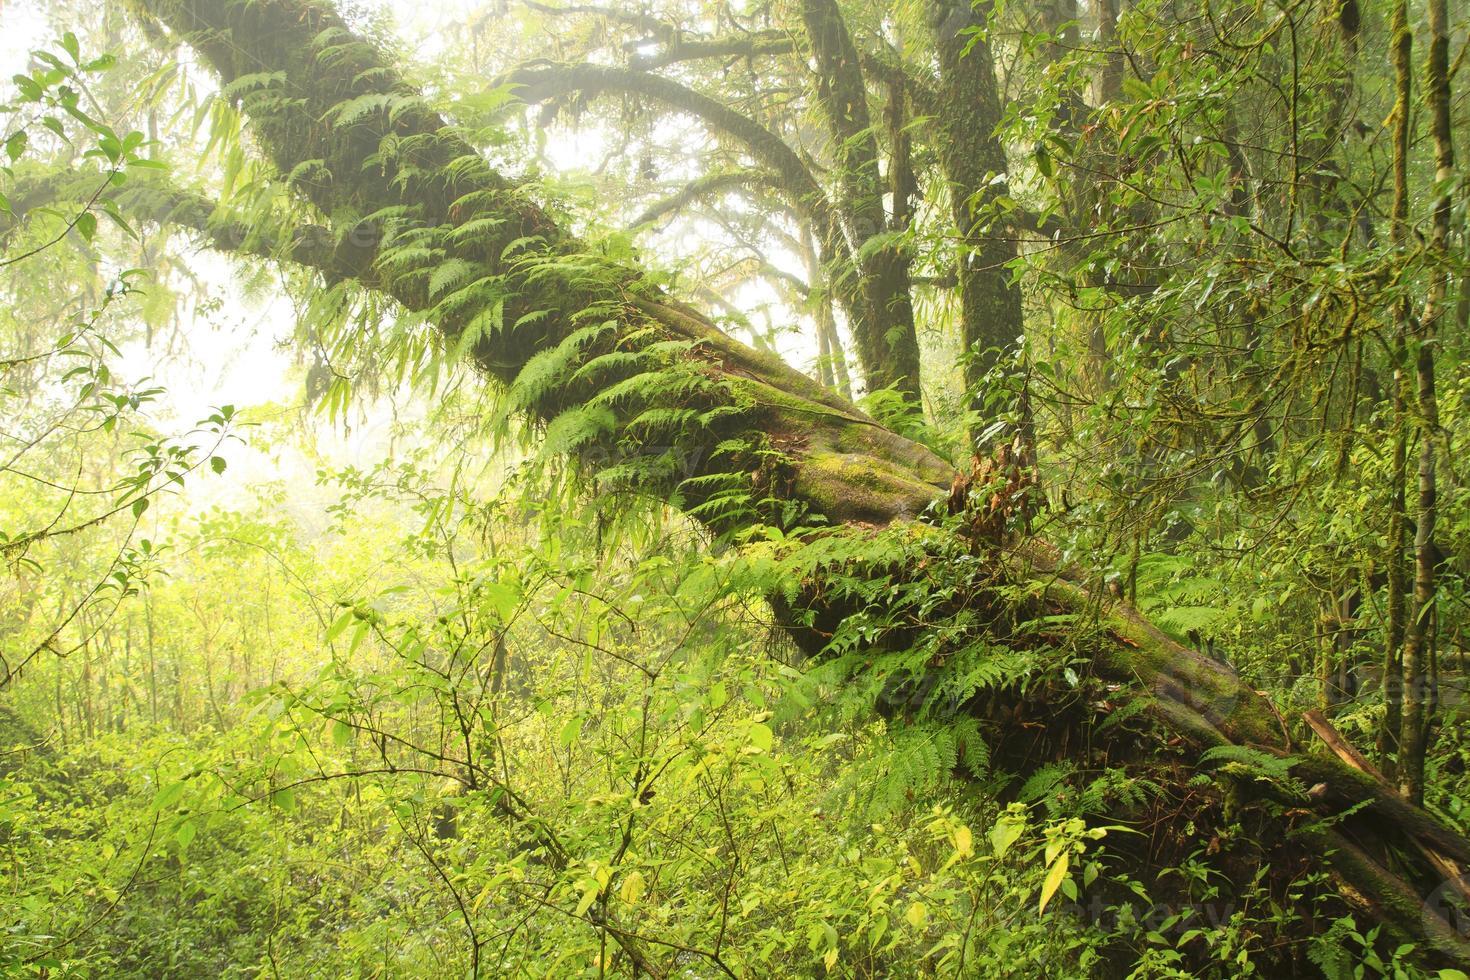 jungle verte, forêt tropicale d'arbres du sentier ang ka photo